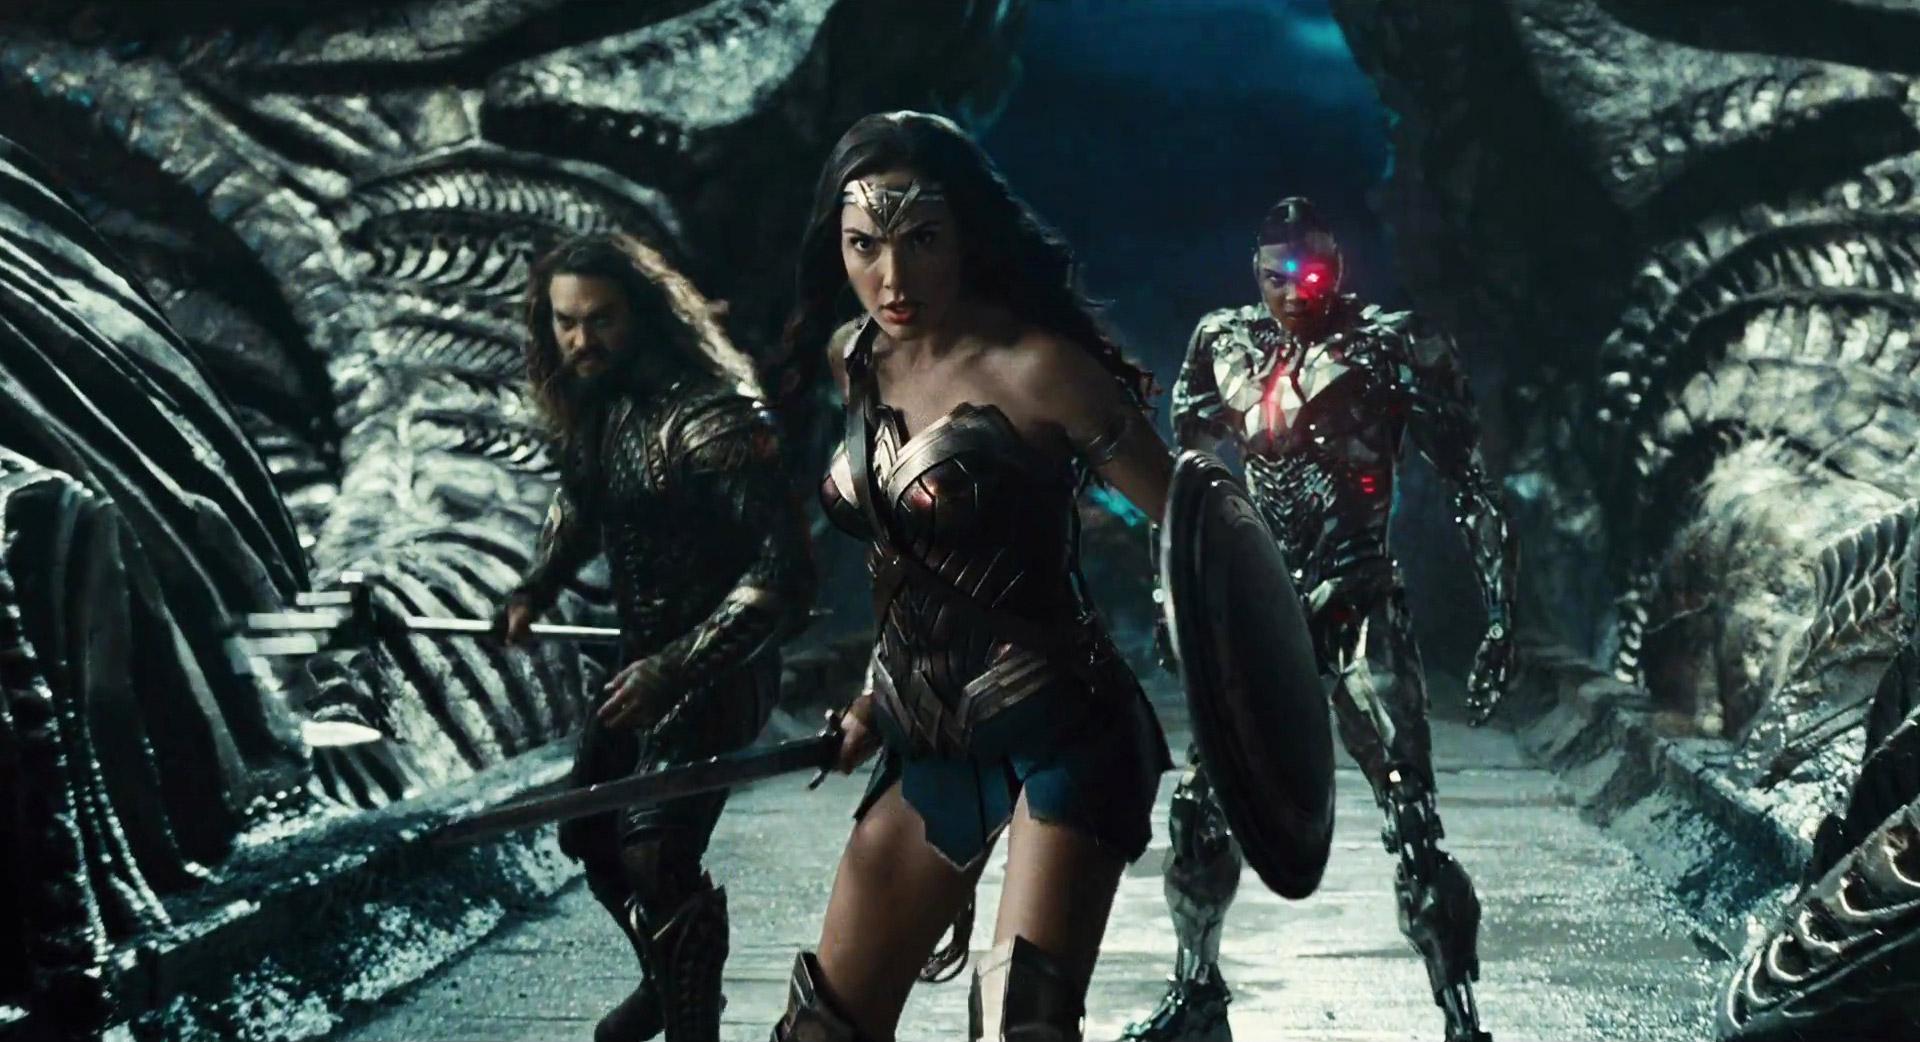 justice league official trailer dc comic book movie